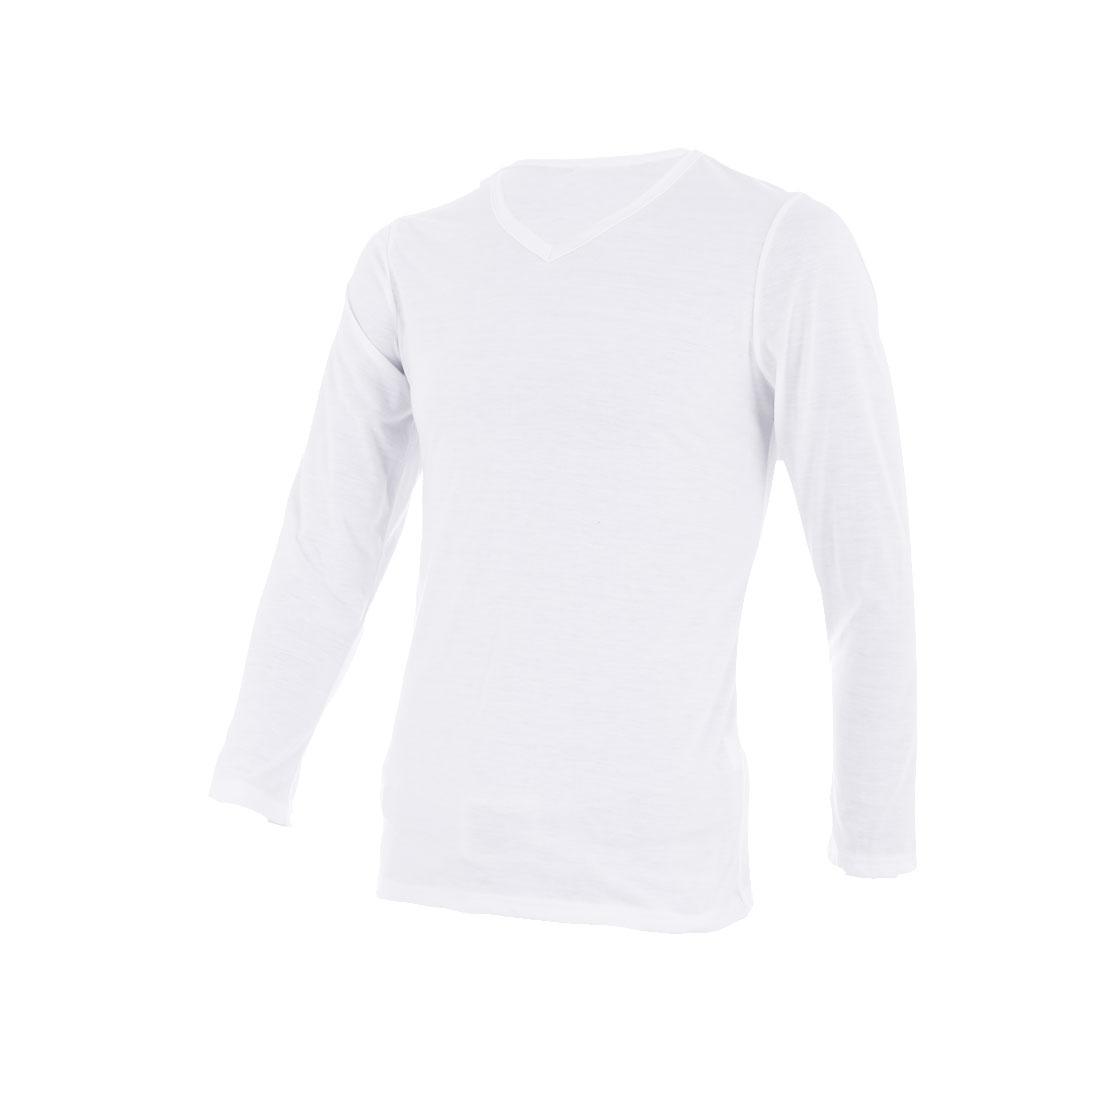 Men V Neck Autumn Wearing T-shirt White S